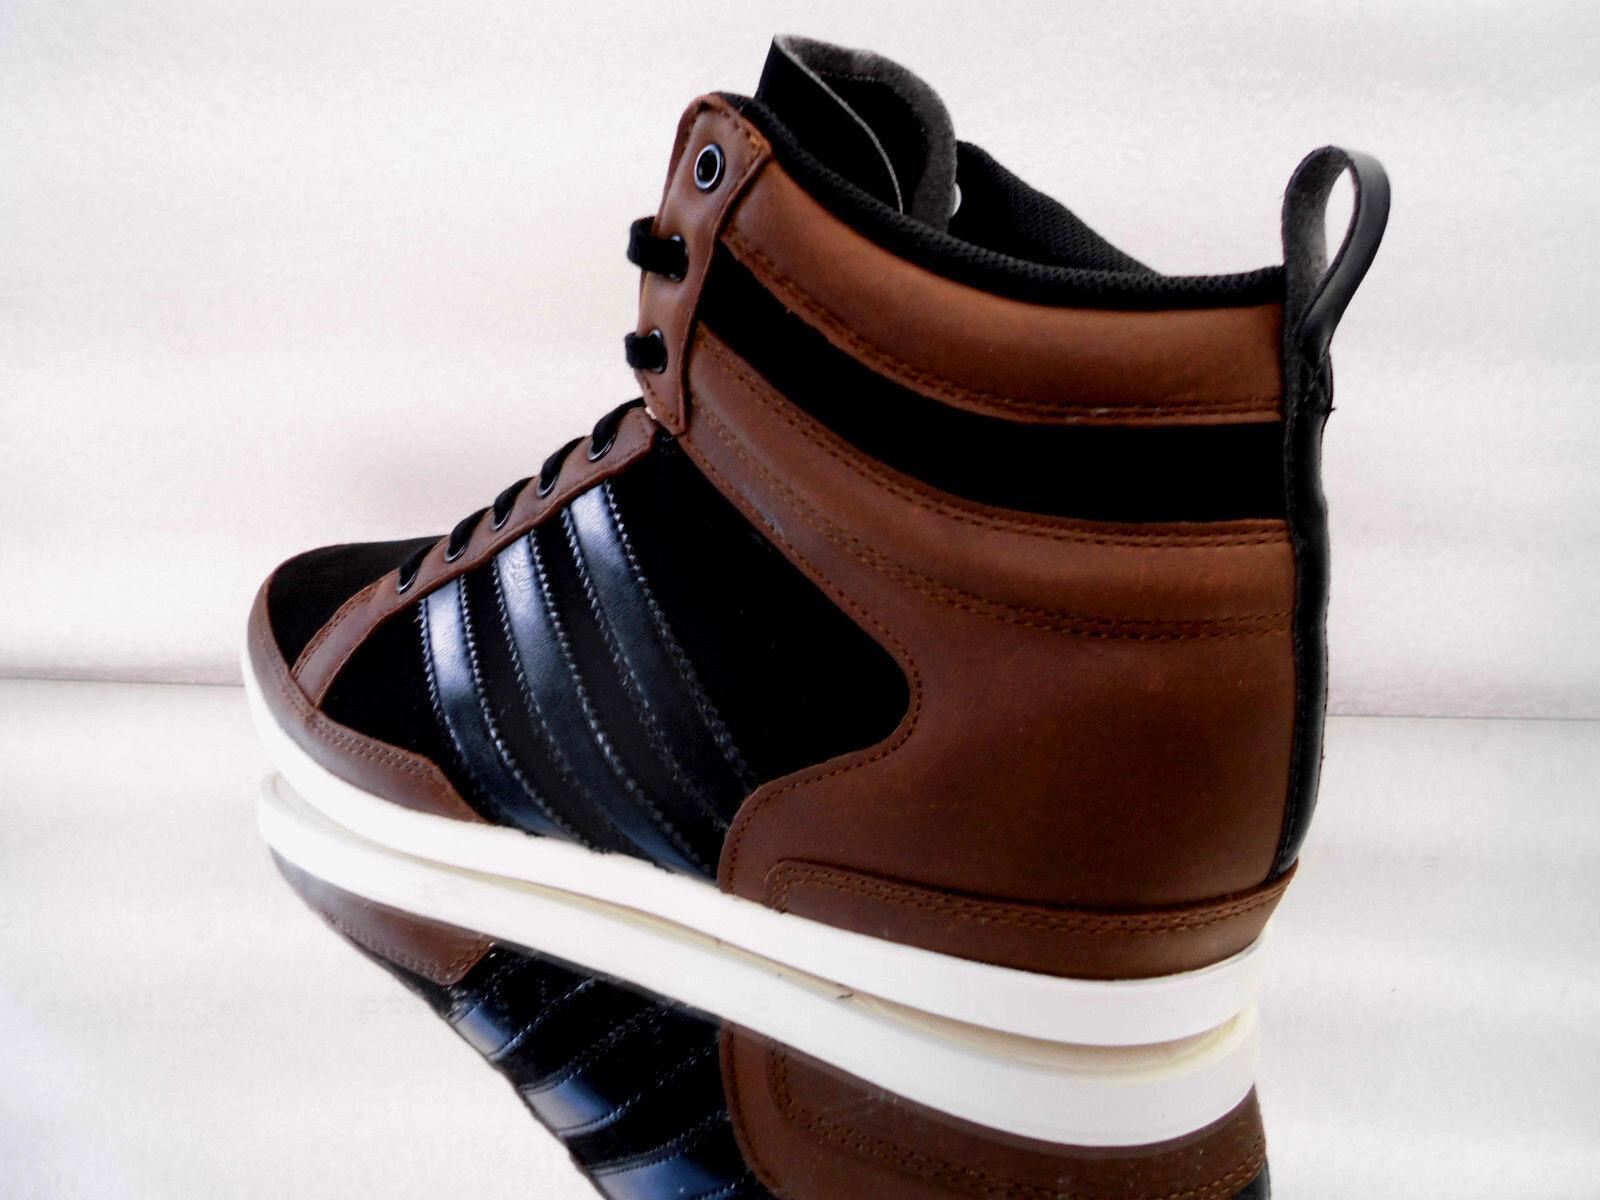 ADIDAS Originals ADI UP Leder/Textil MID M20425 Turnschuhe Sneaker Leder/Textil UP M20425 Neu 023987